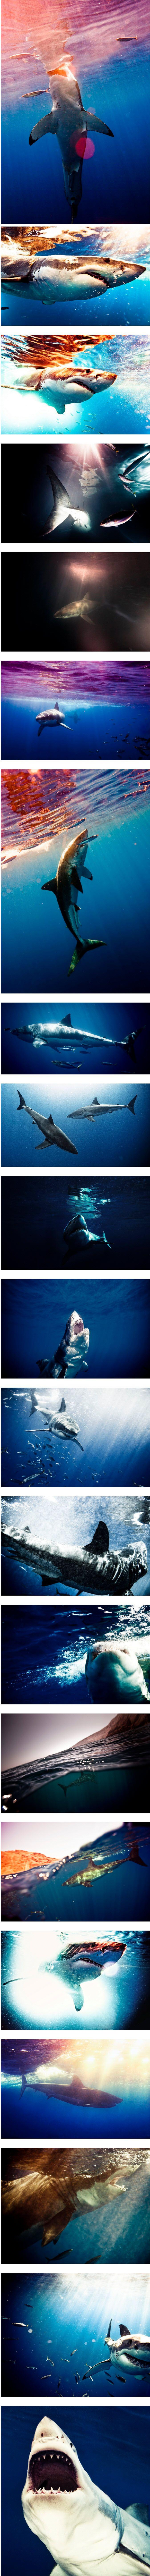 Beautiful images of sharks #sharkweek | Children's Dentistry | #Bountiful | #UT | www.utahchildrensdentistry.com